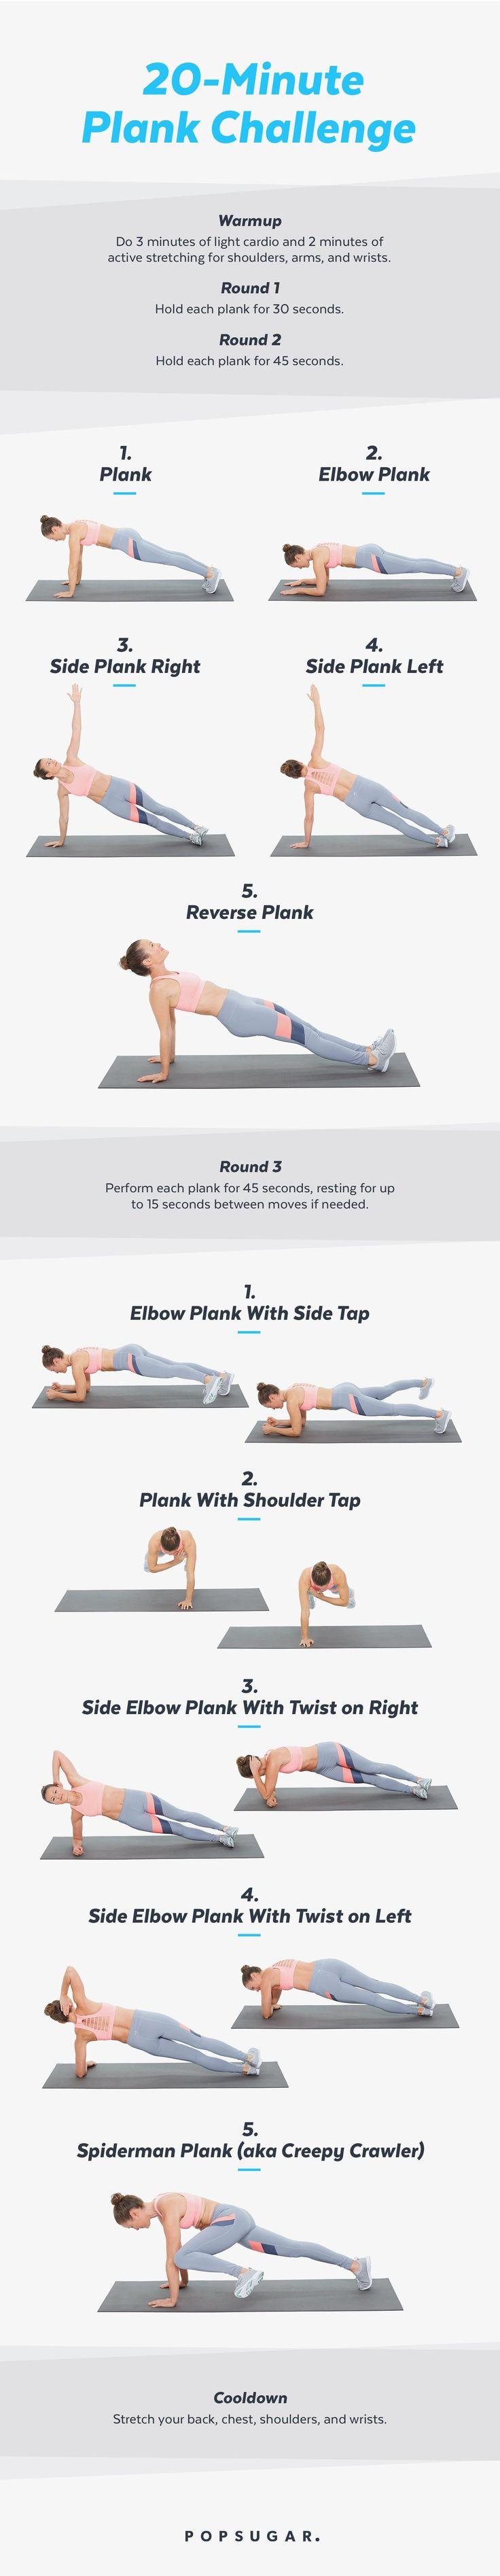 20-min Plank Challenge